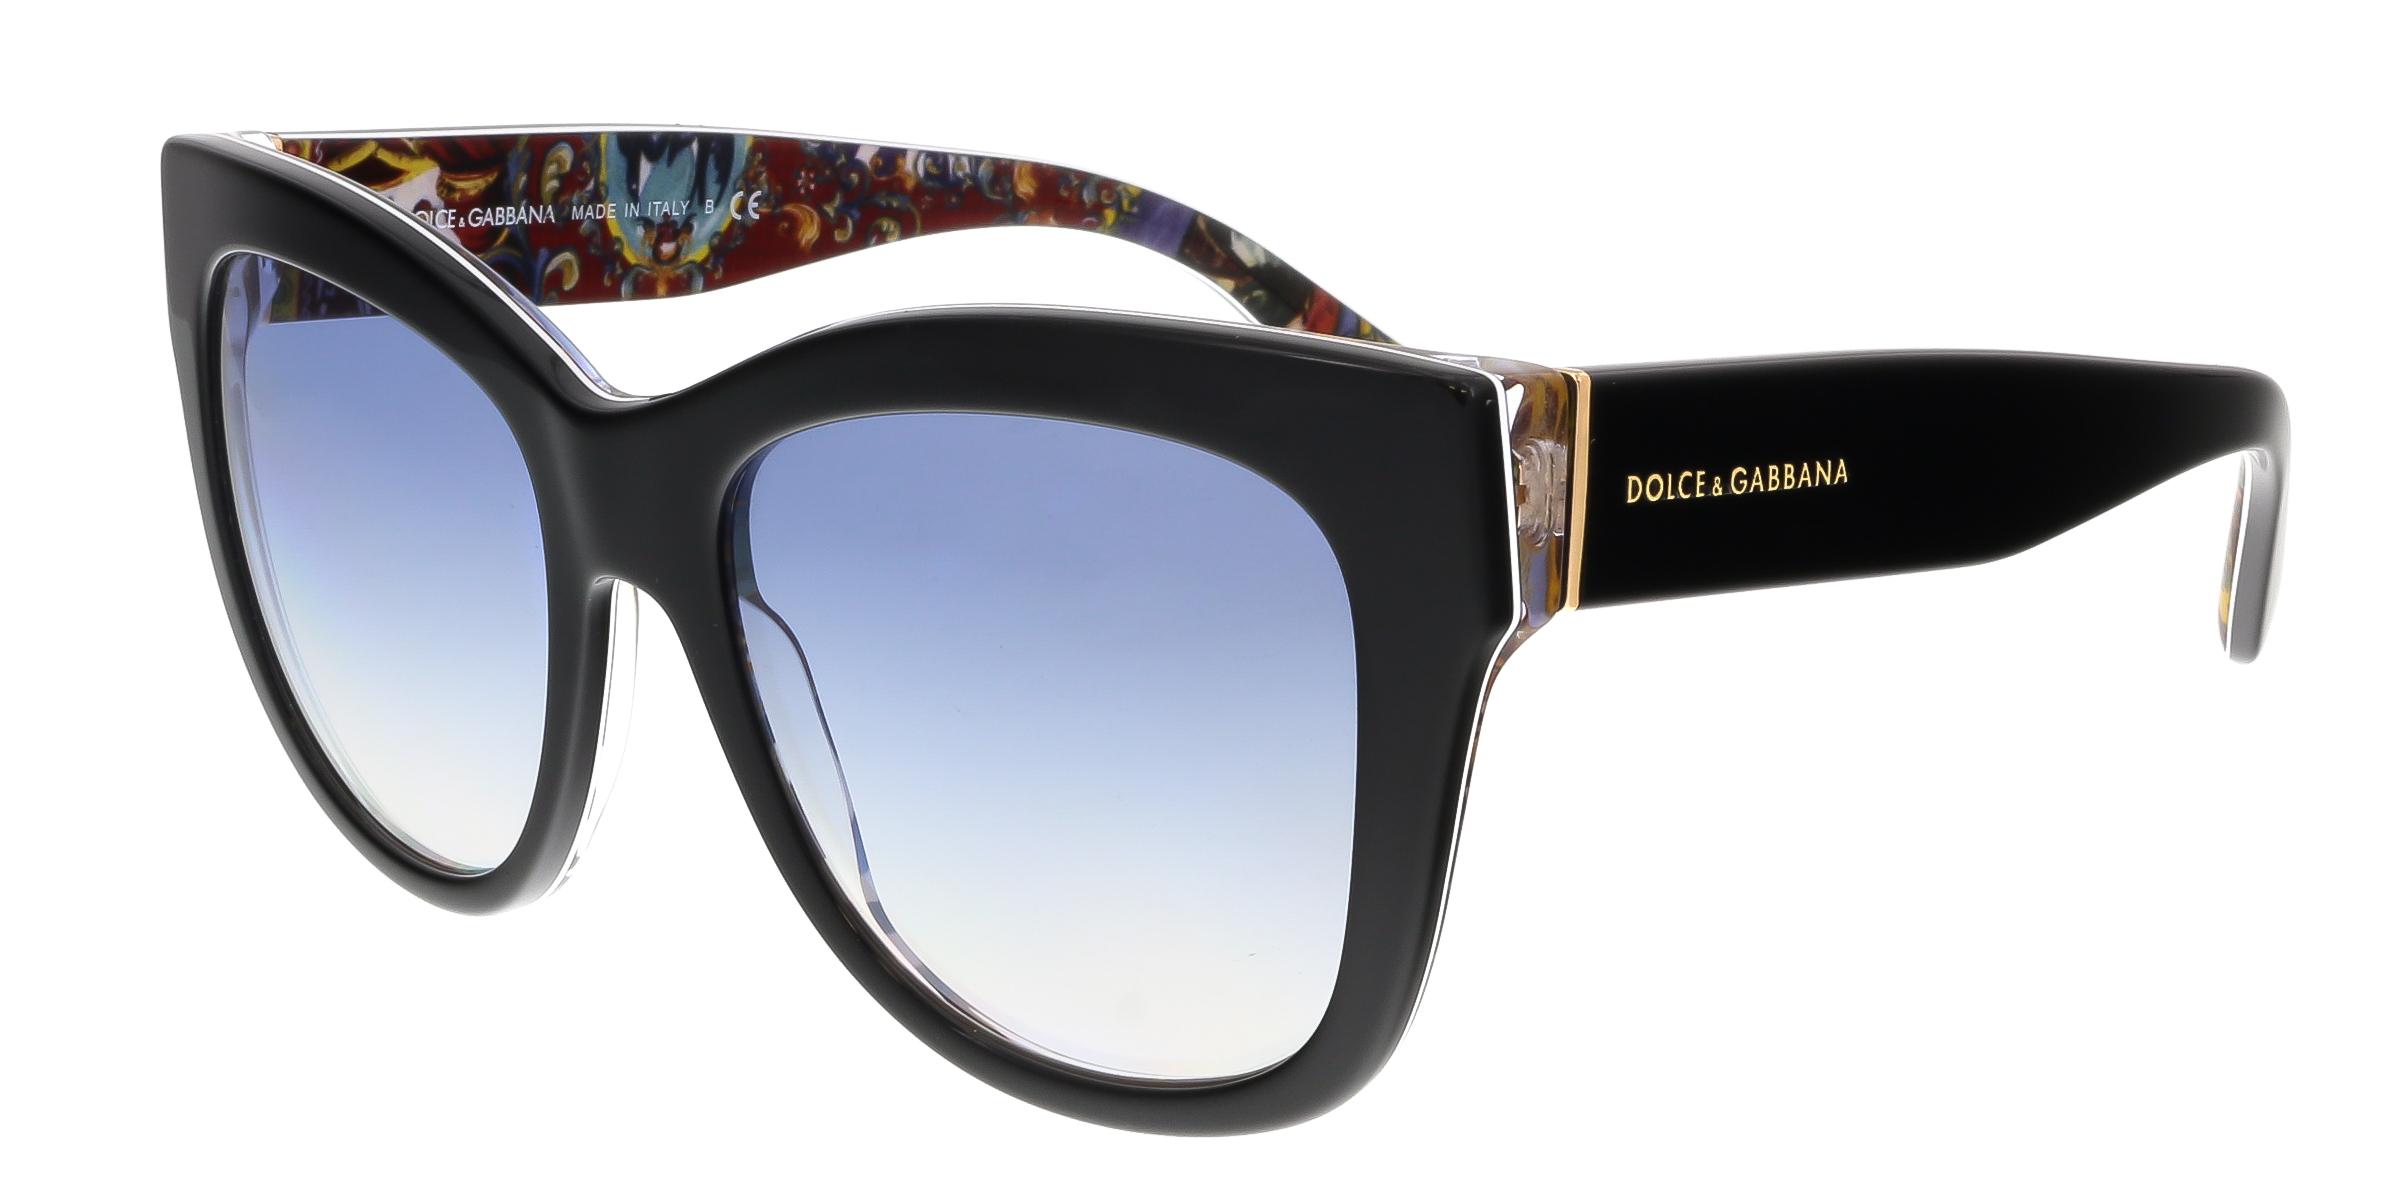 Dolce & Gabbana DG4270 303319 Black Cateye  Sunglasses